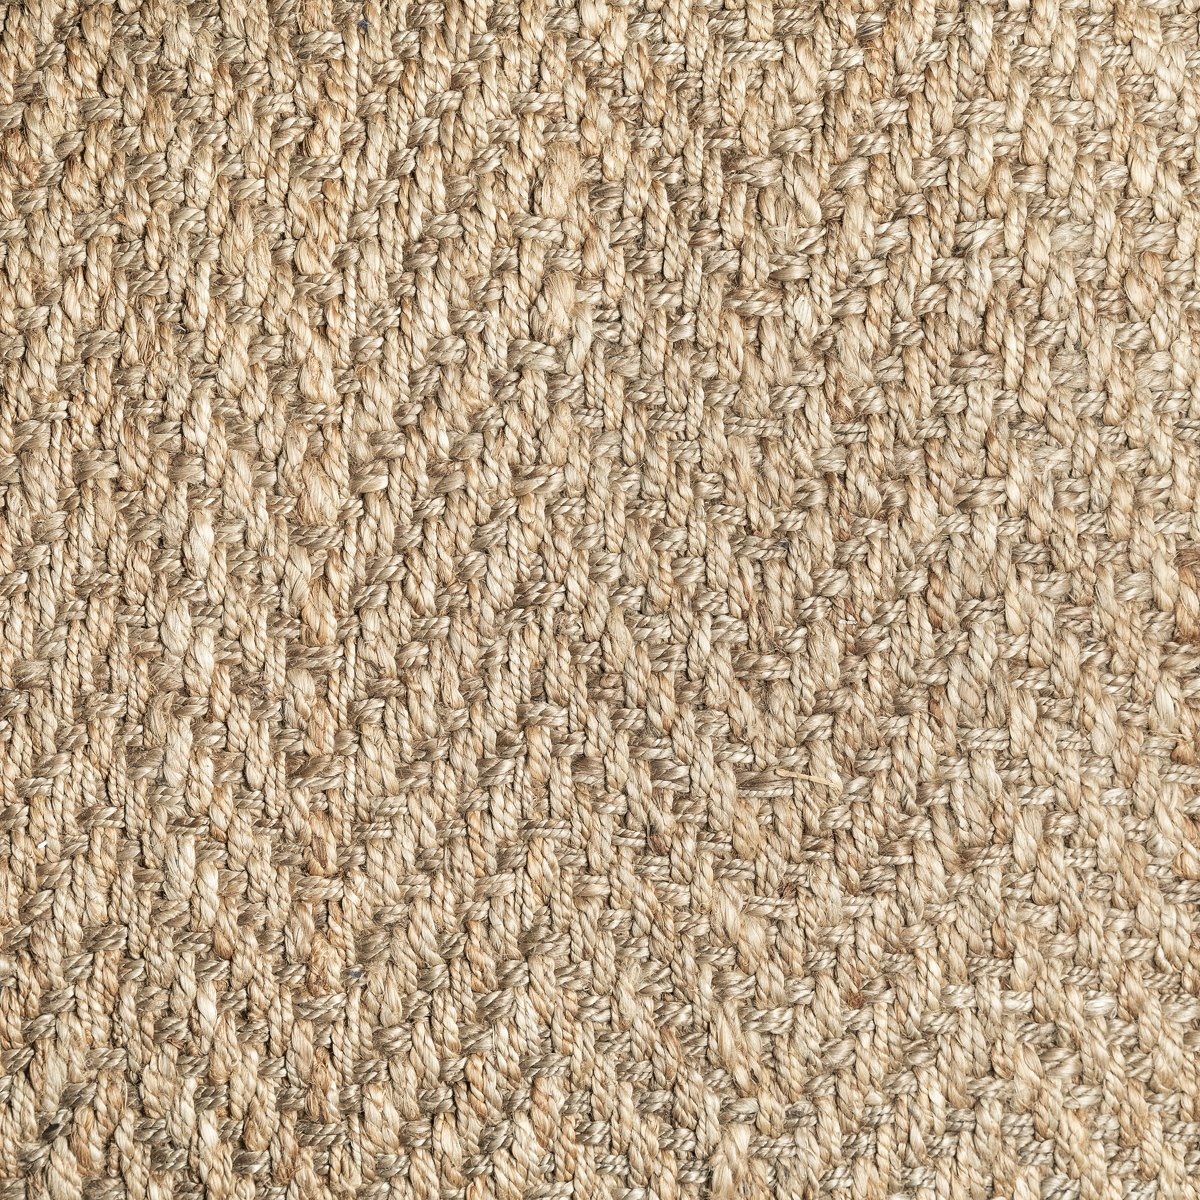 Herringbone Light Brown Jute 5x8 Area Rug